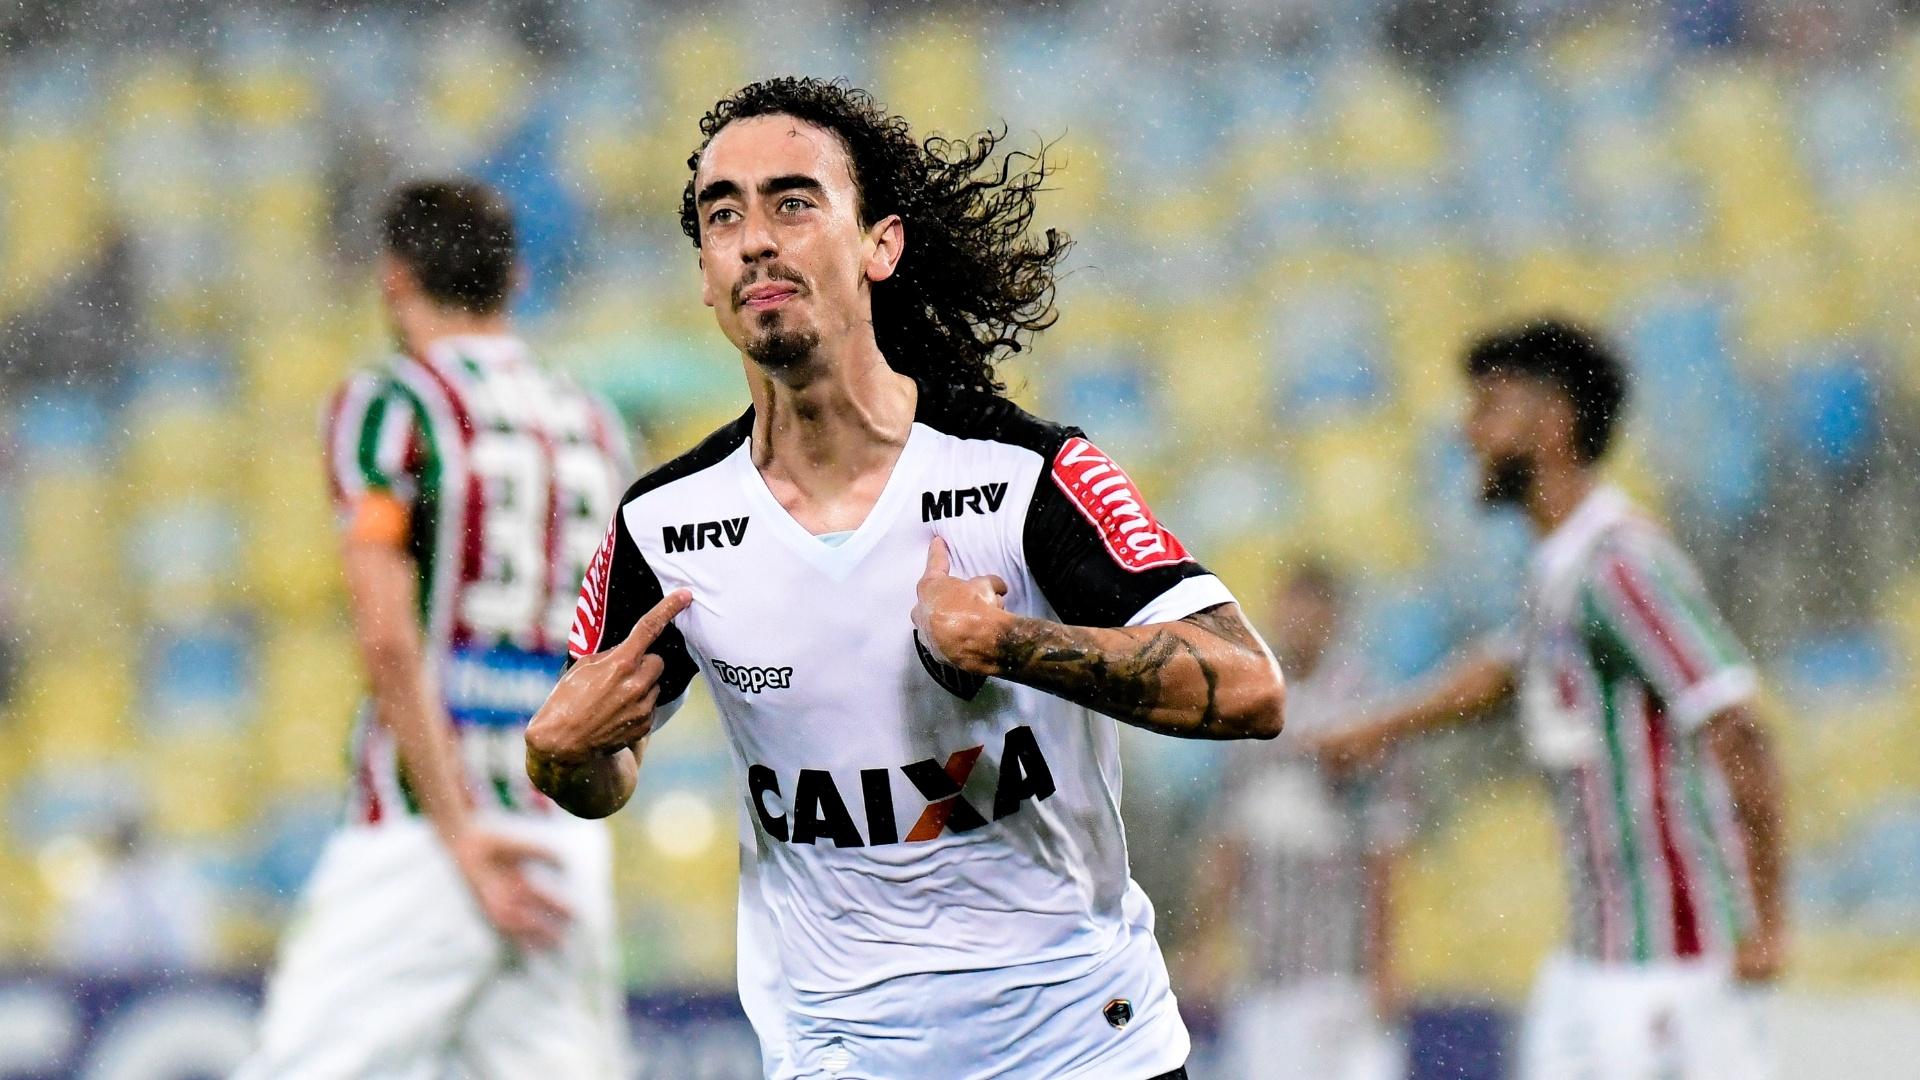 Valdivia comemora gol do Atlético-MG contra o Fluminense pelo Campeonato Brasileiro